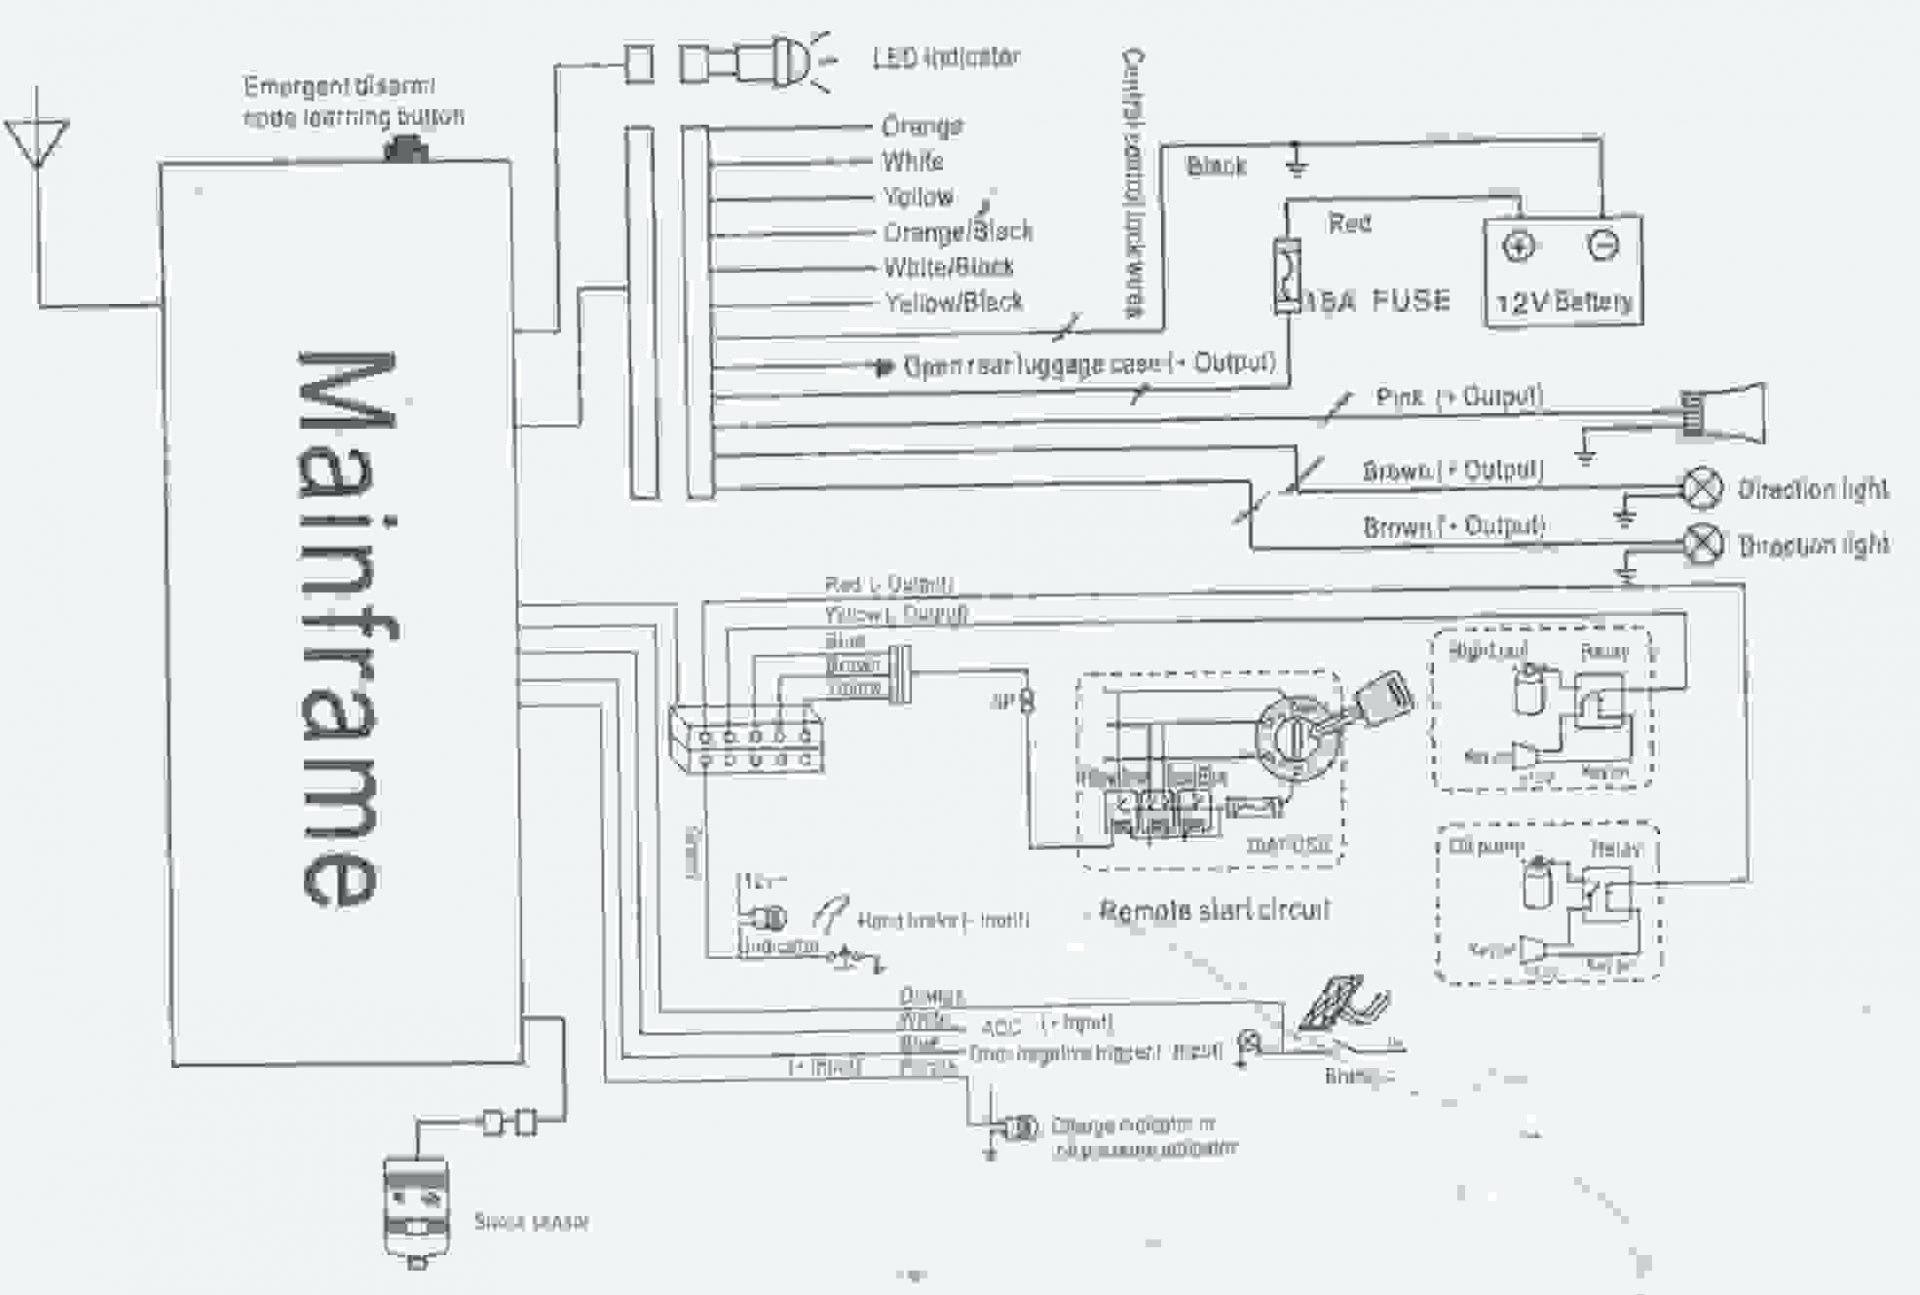 Car Alarm System Diagram Alarm Wiring Diagrams for Cars Of Car Alarm System Diagram